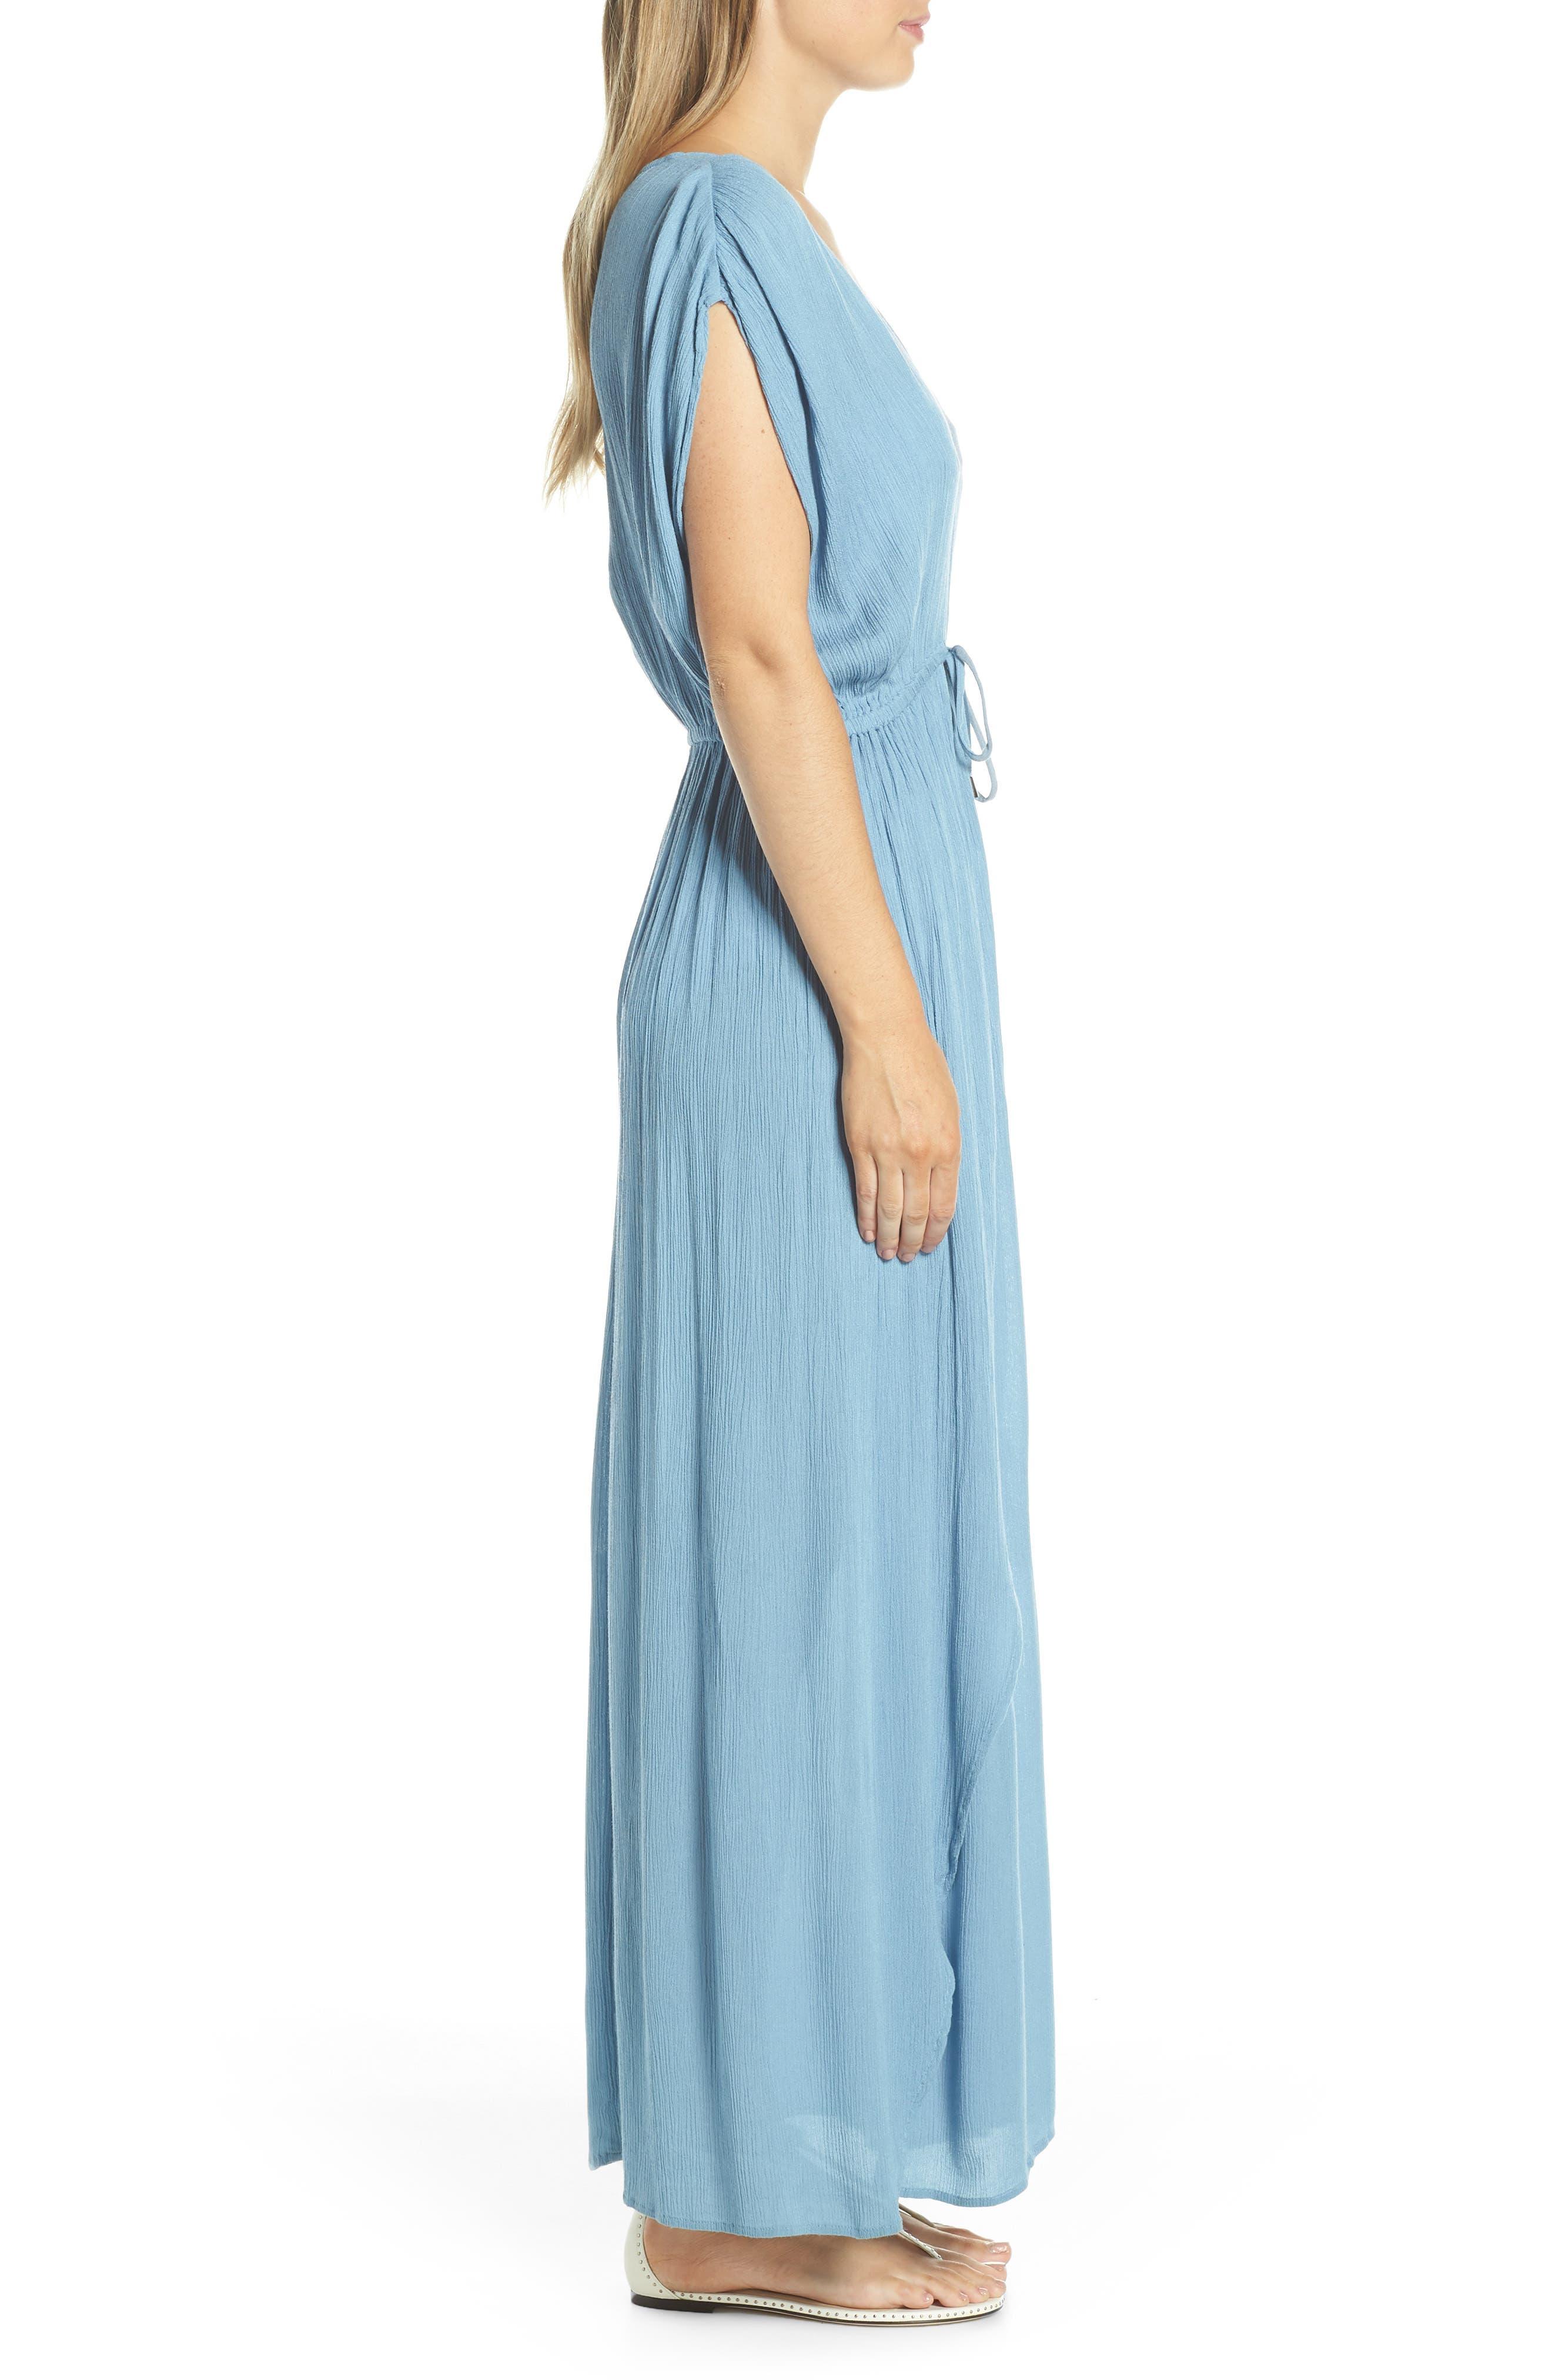 ELAN, Wrap Maxi Cover-Up Dress, Alternate thumbnail 3, color, WASHED BLUE